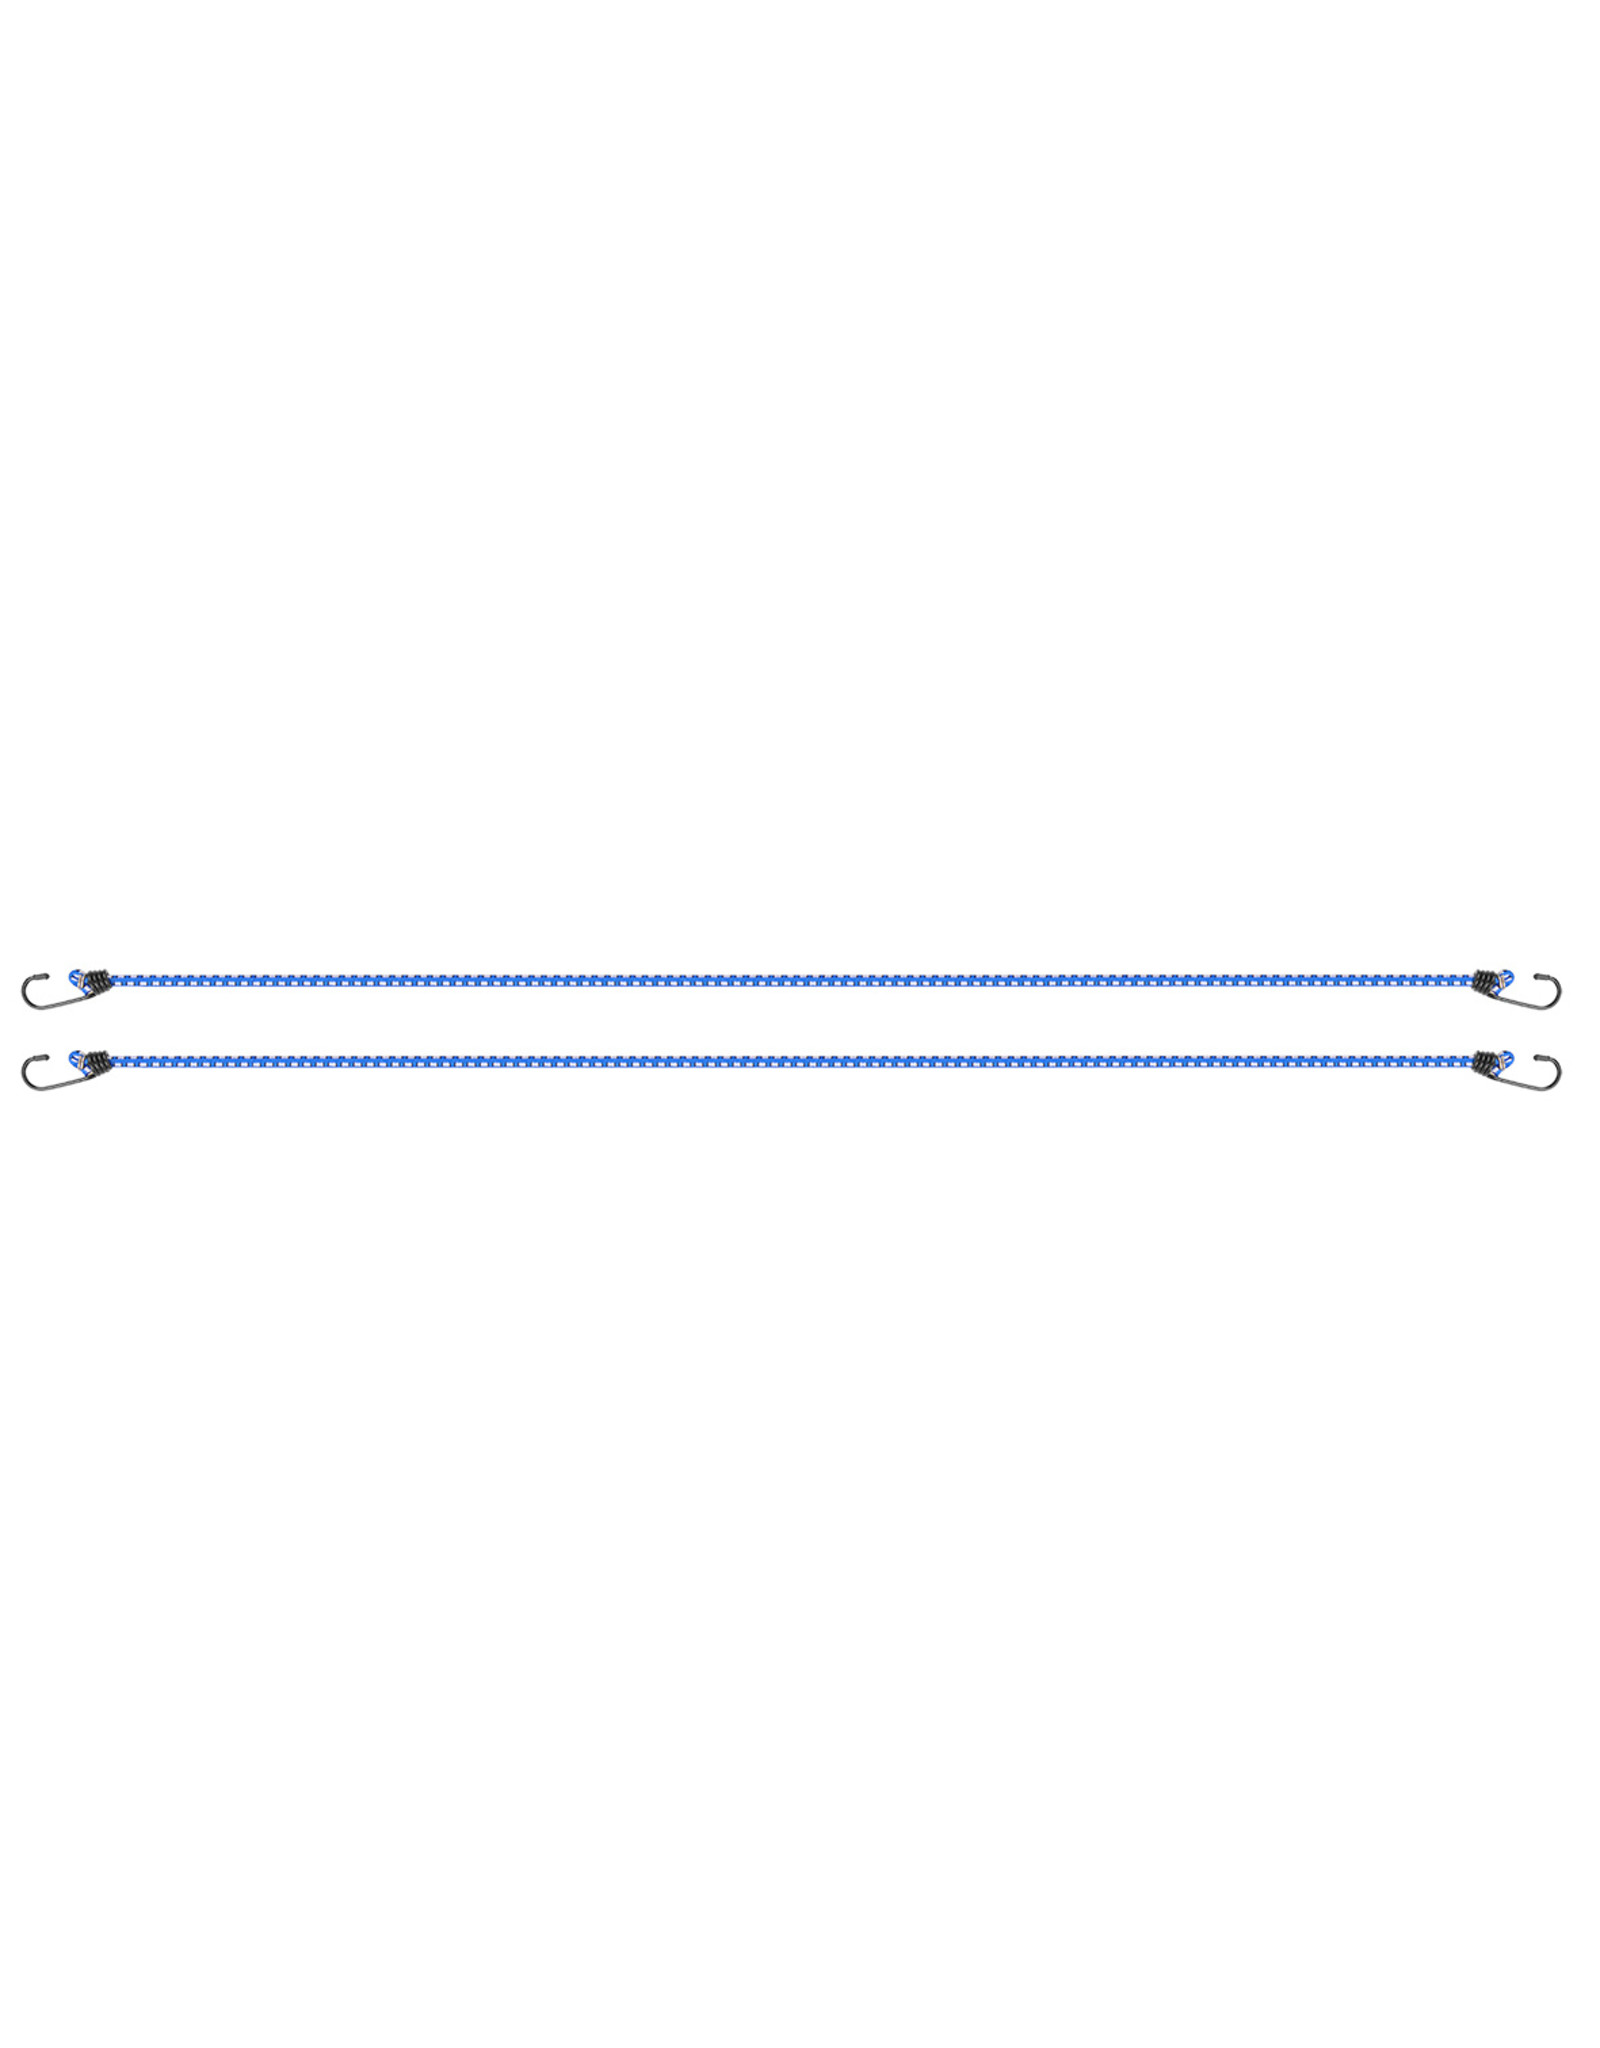 Bagagespin 10mm - 150cm set van 2 stuks